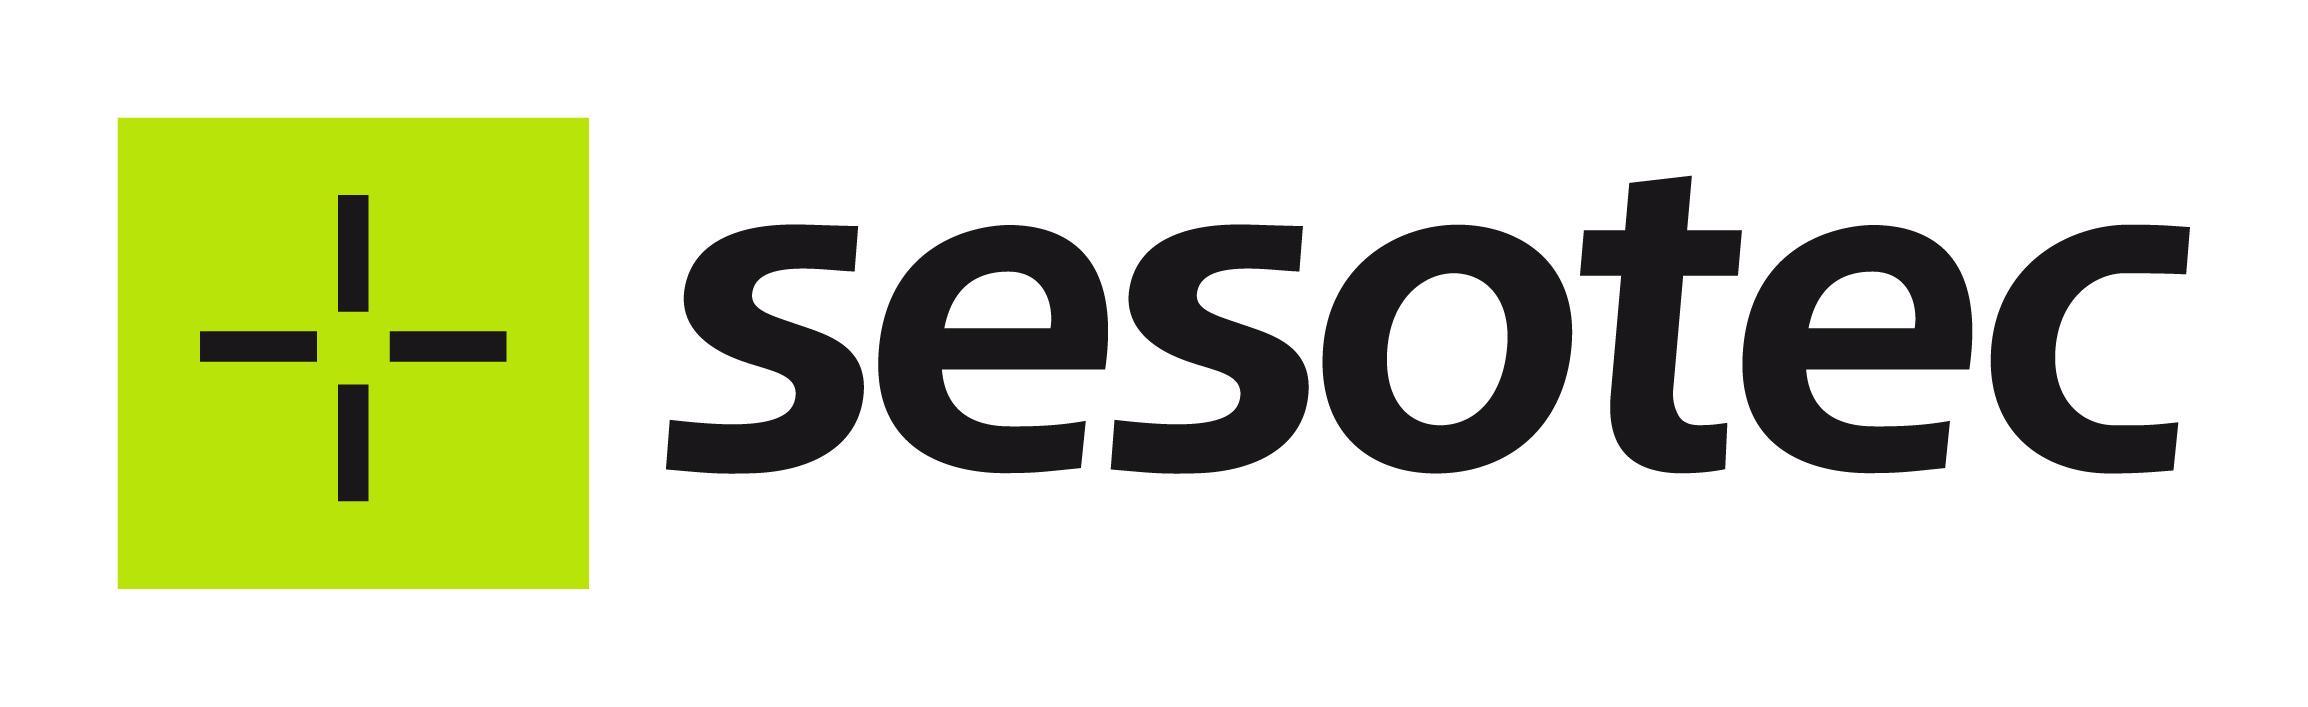 Sesotec GmbH